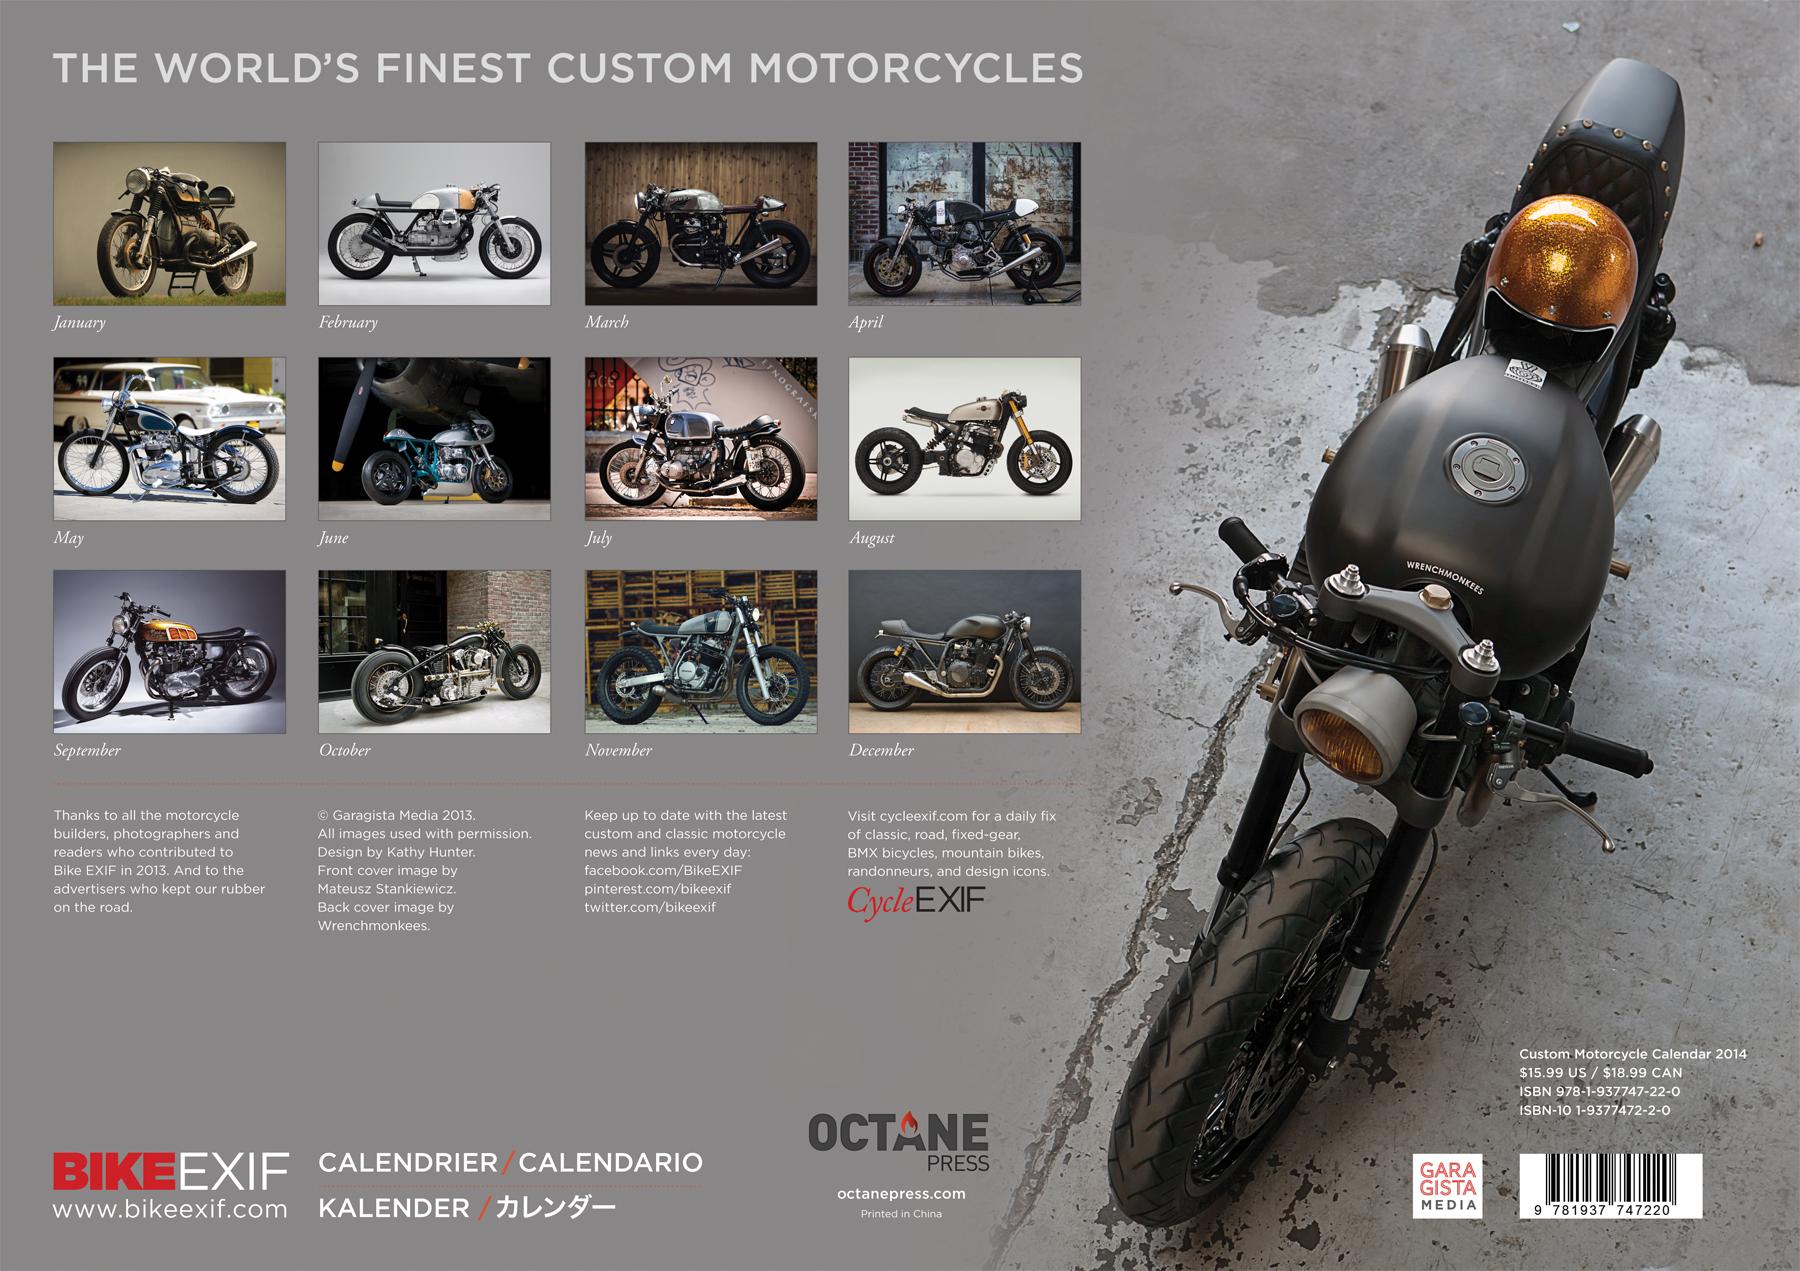 Bike Exif Calendar 2014 Bike EXIF Custom